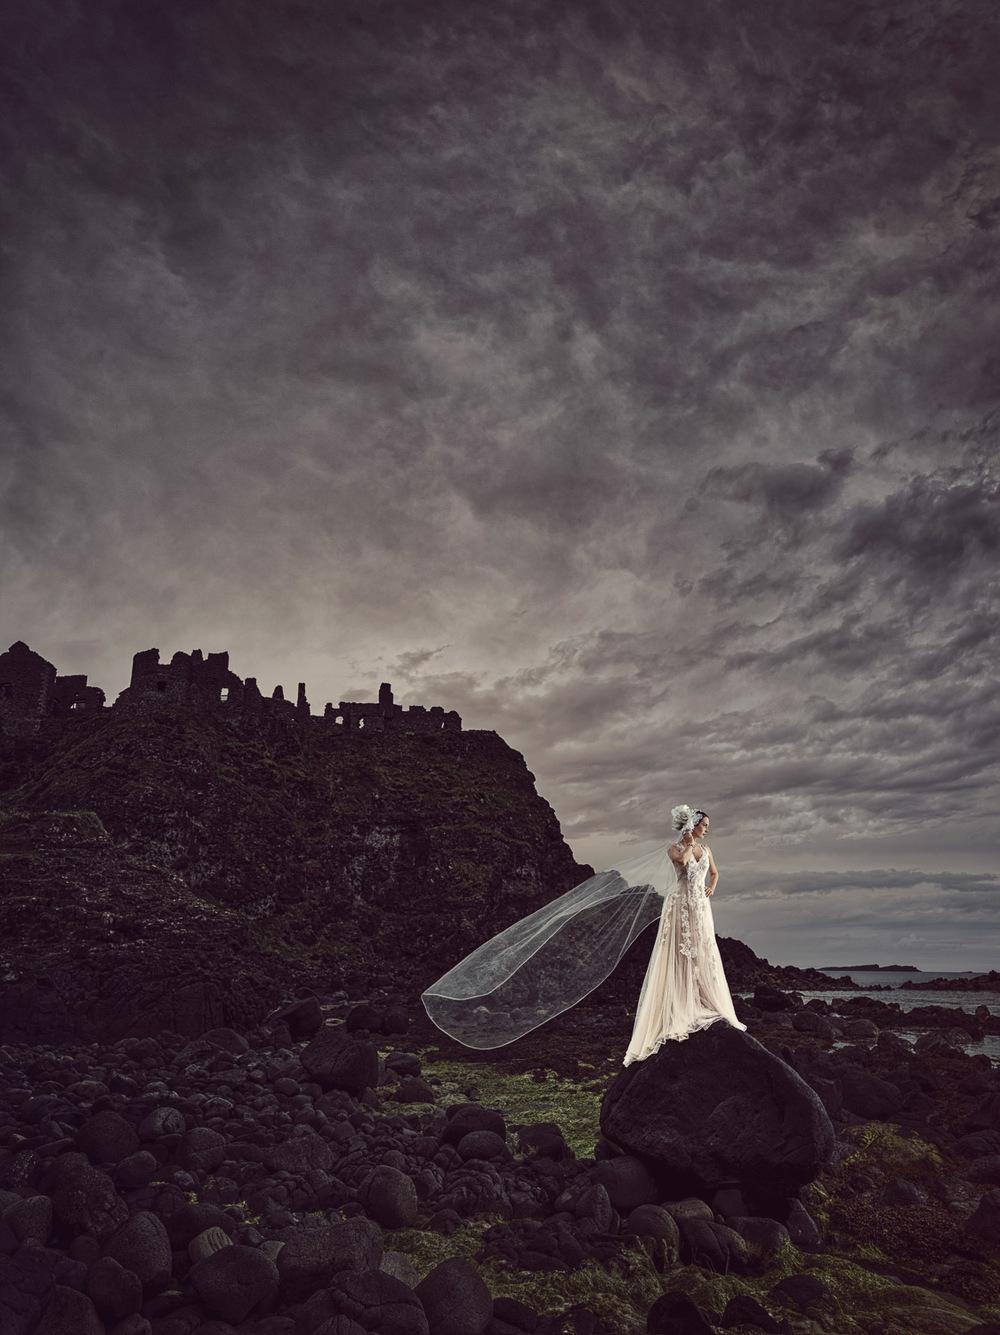 stlouis_wedding_photography_B0000959_Final.jpg